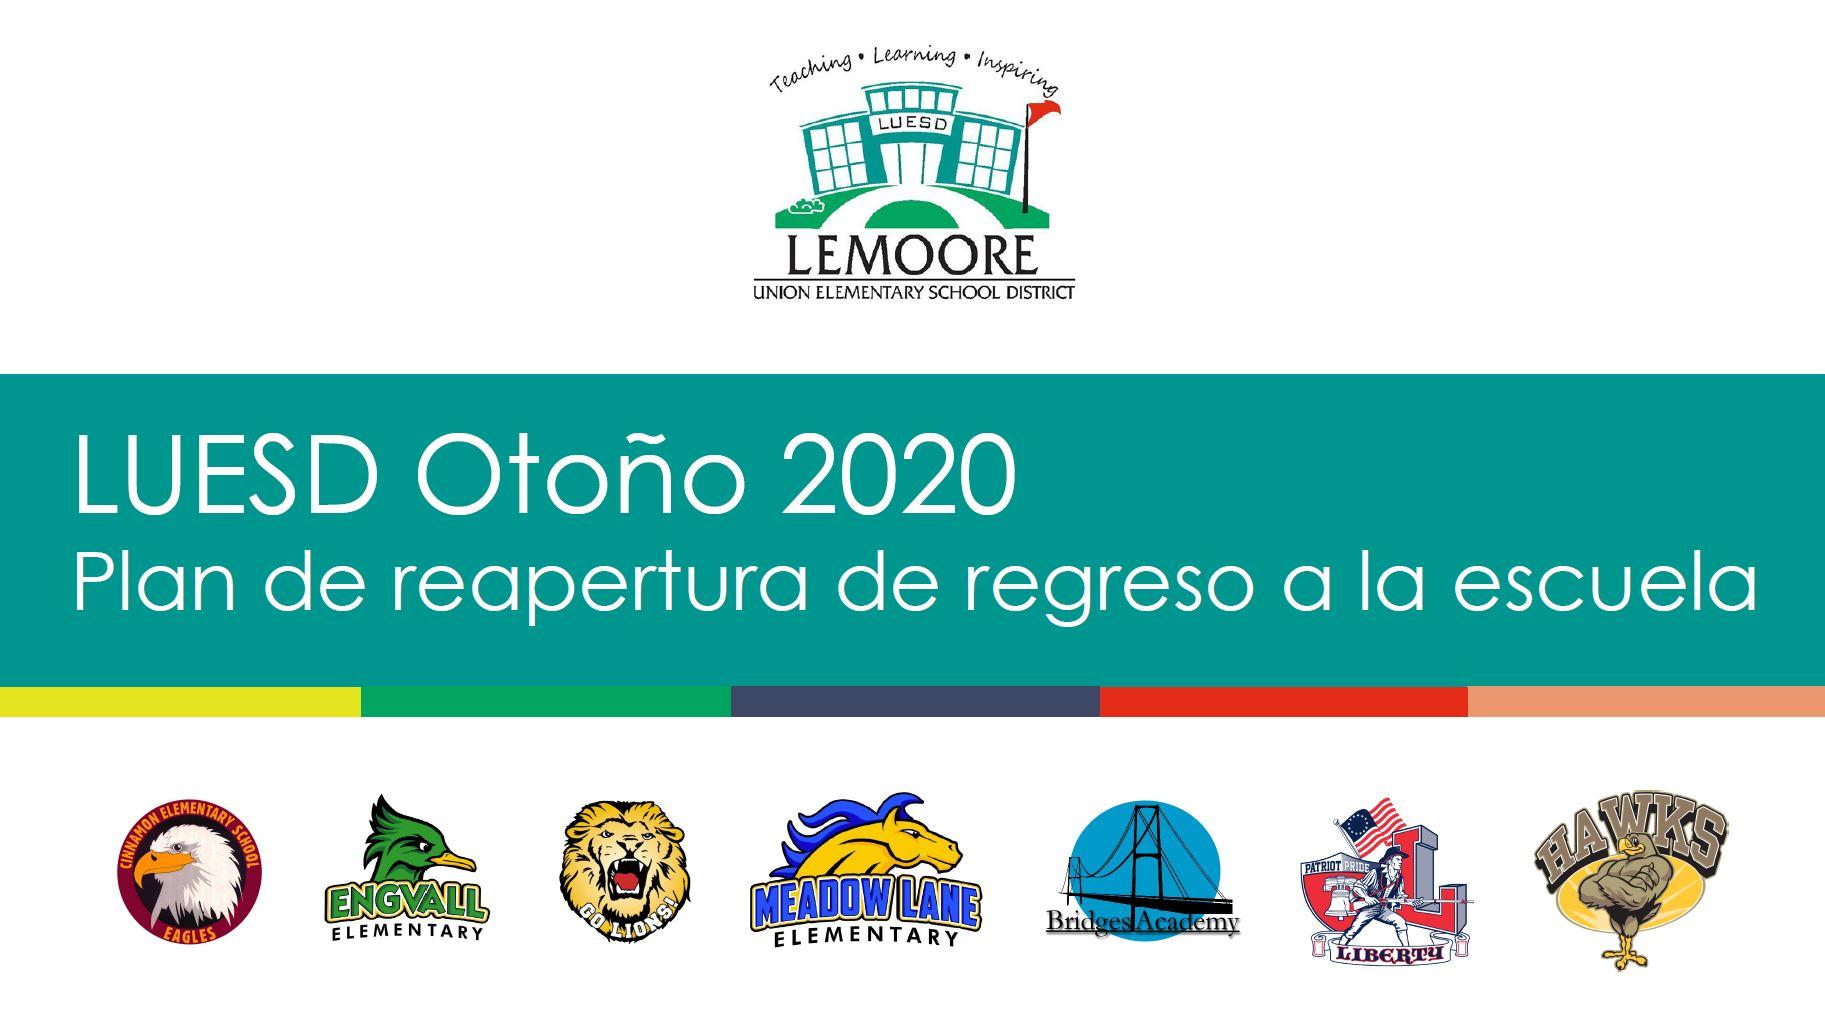 LUESD Otoño 2020